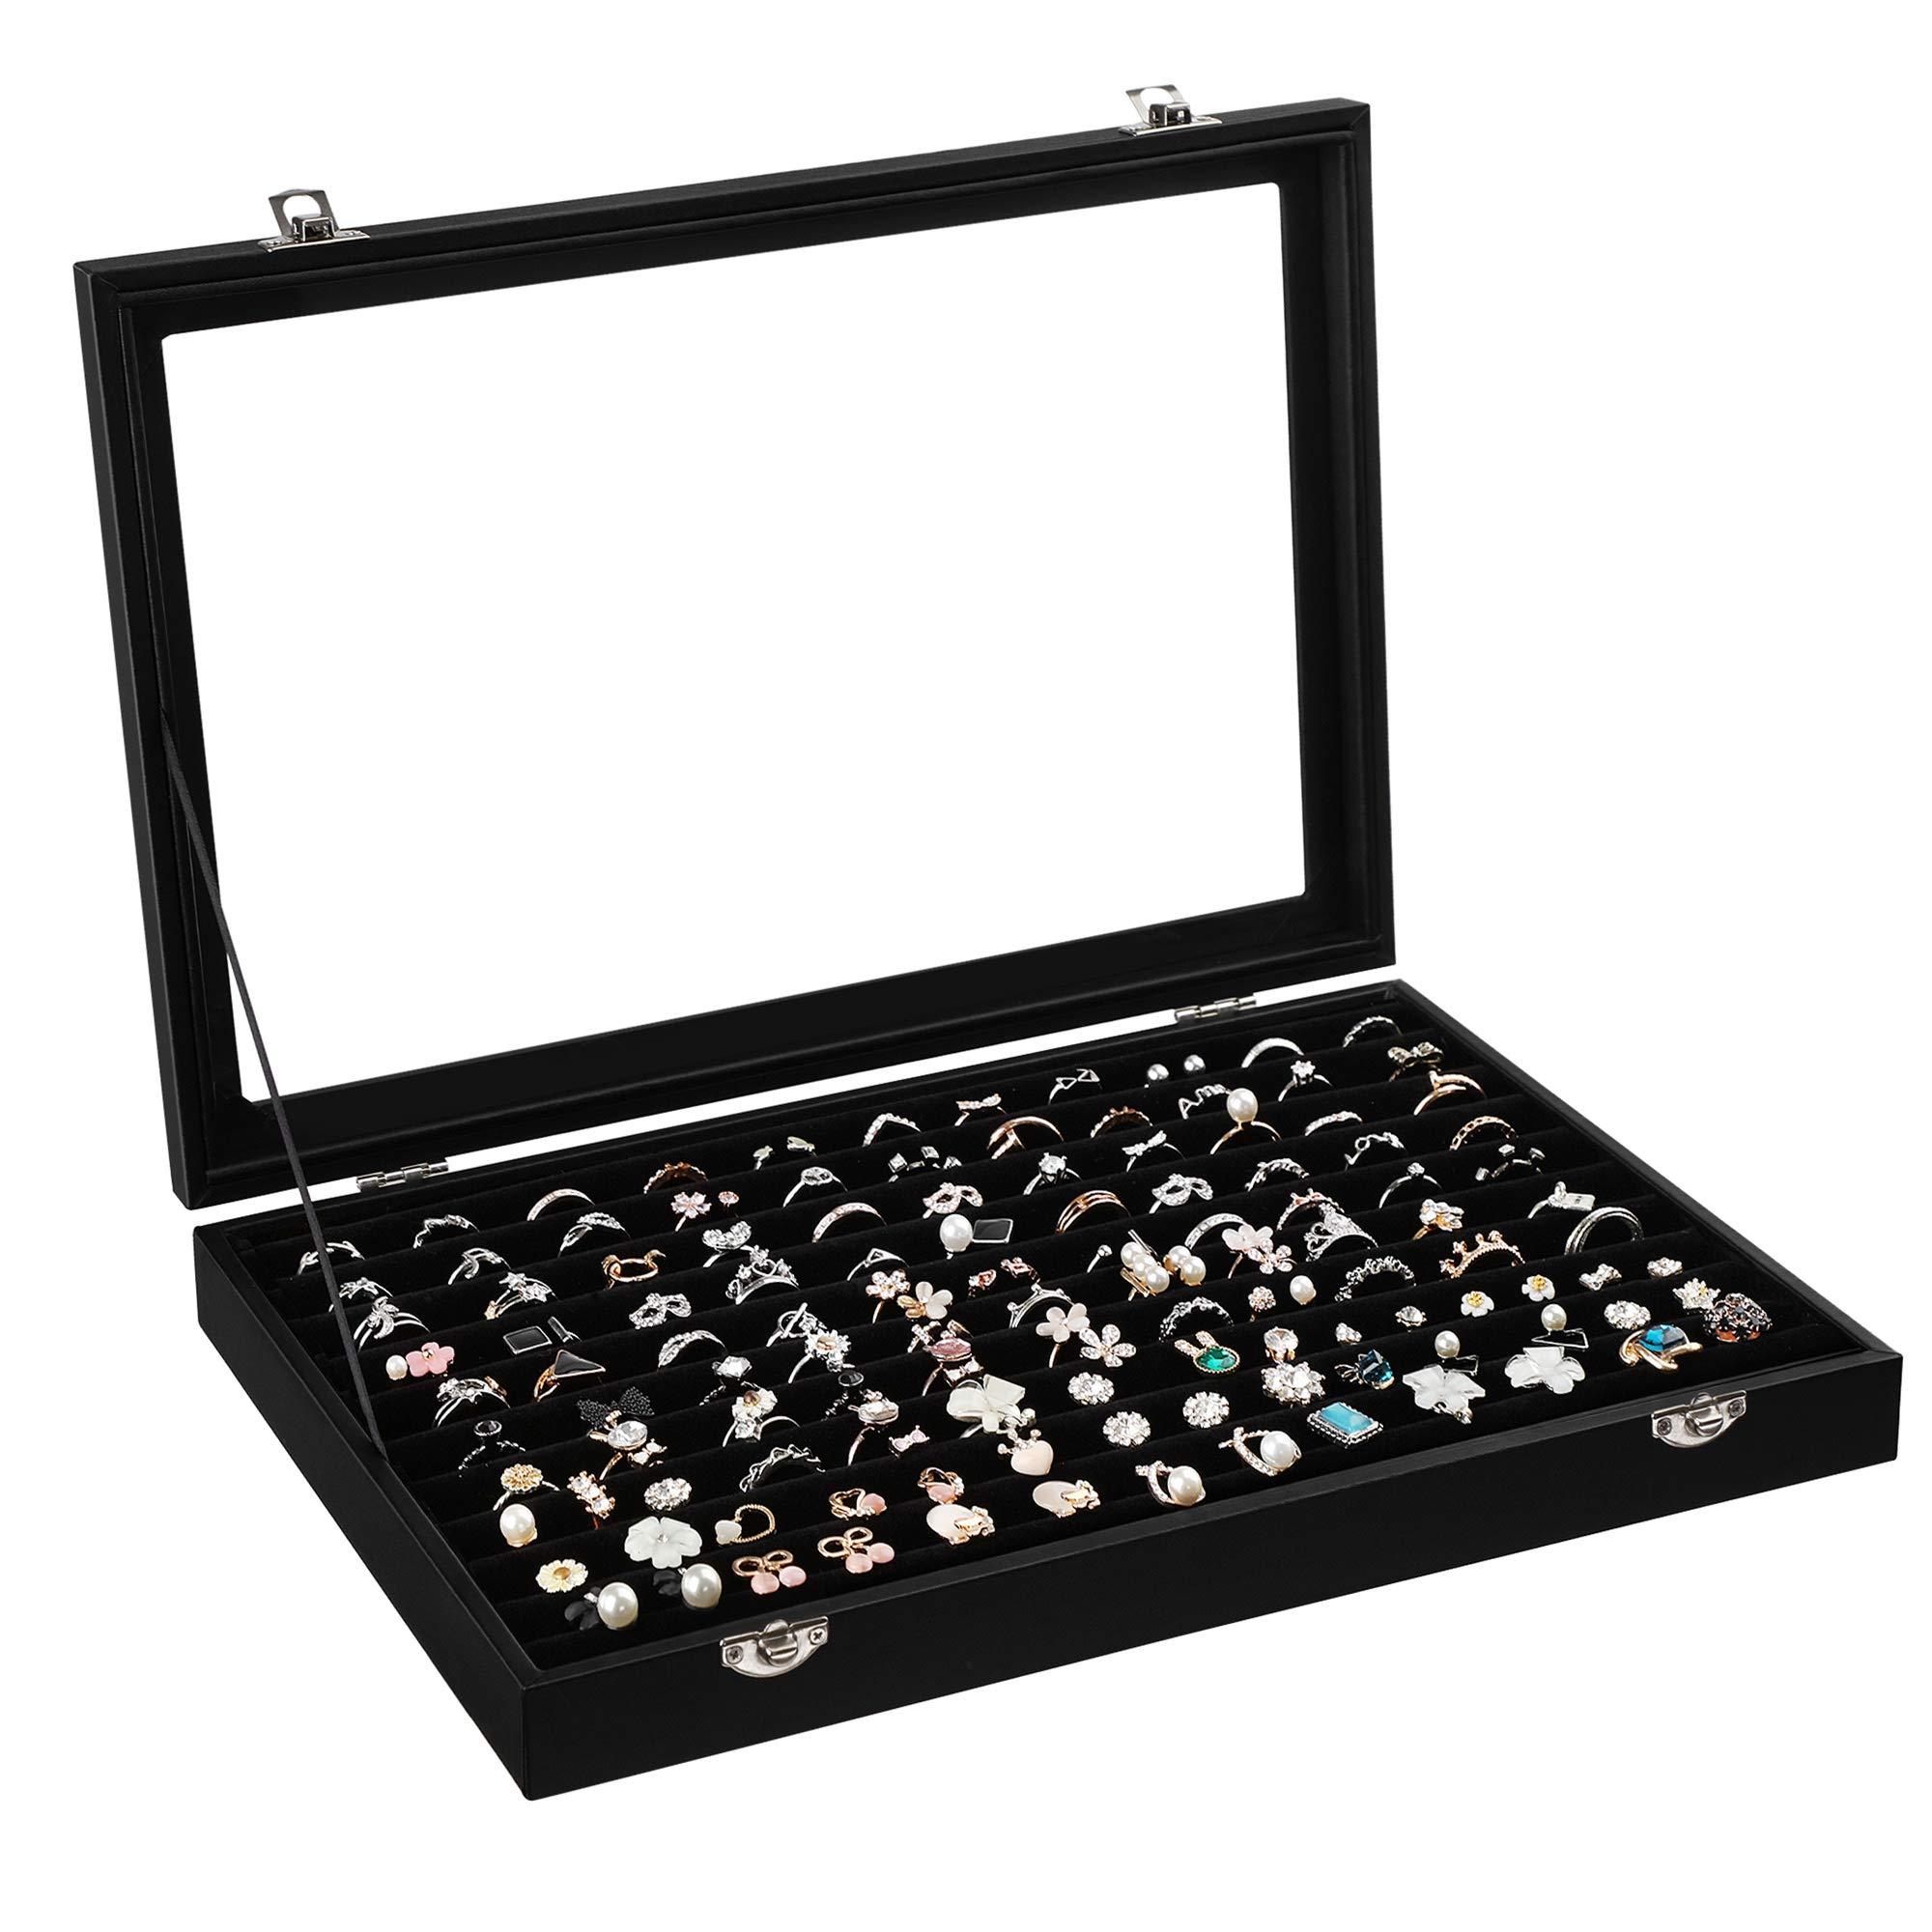 SONGMICS 7 Rows Glass Lid Black Jewelry Display Case Ring Organizer Jewelry Case UJDS301